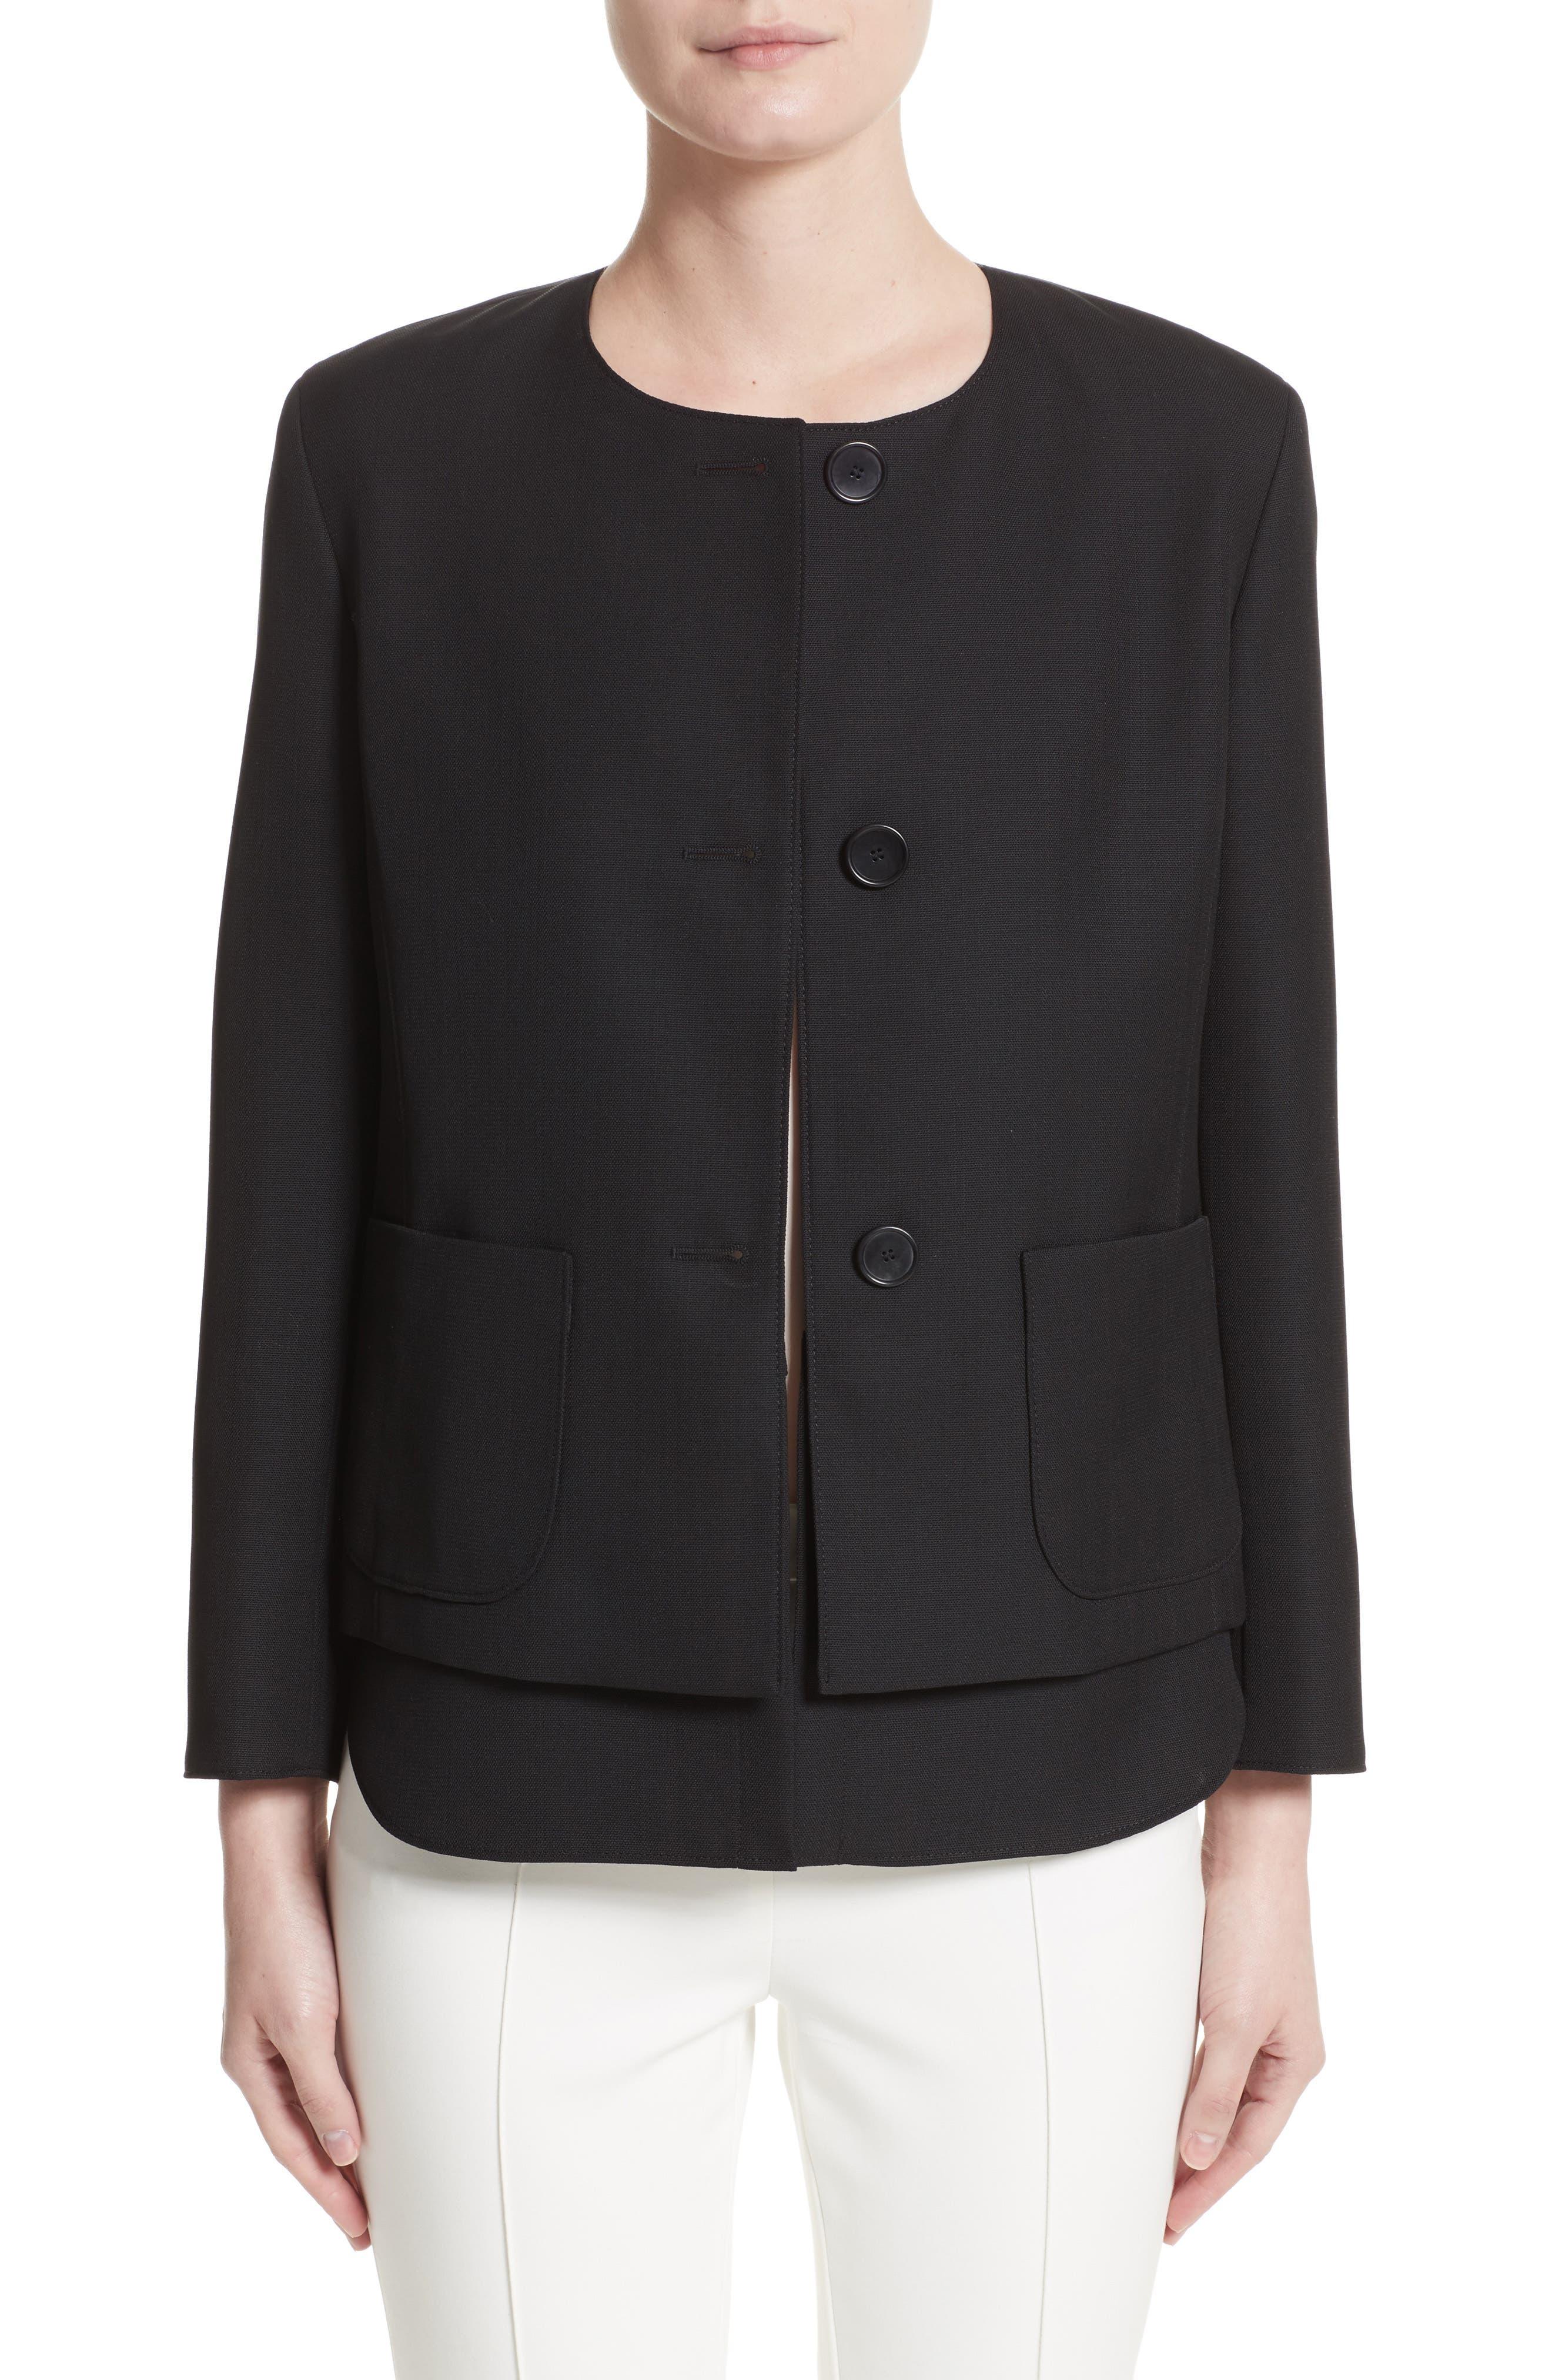 Alternate Image 1 Selected - Akris punto Wool Jacket with Detachable Hem